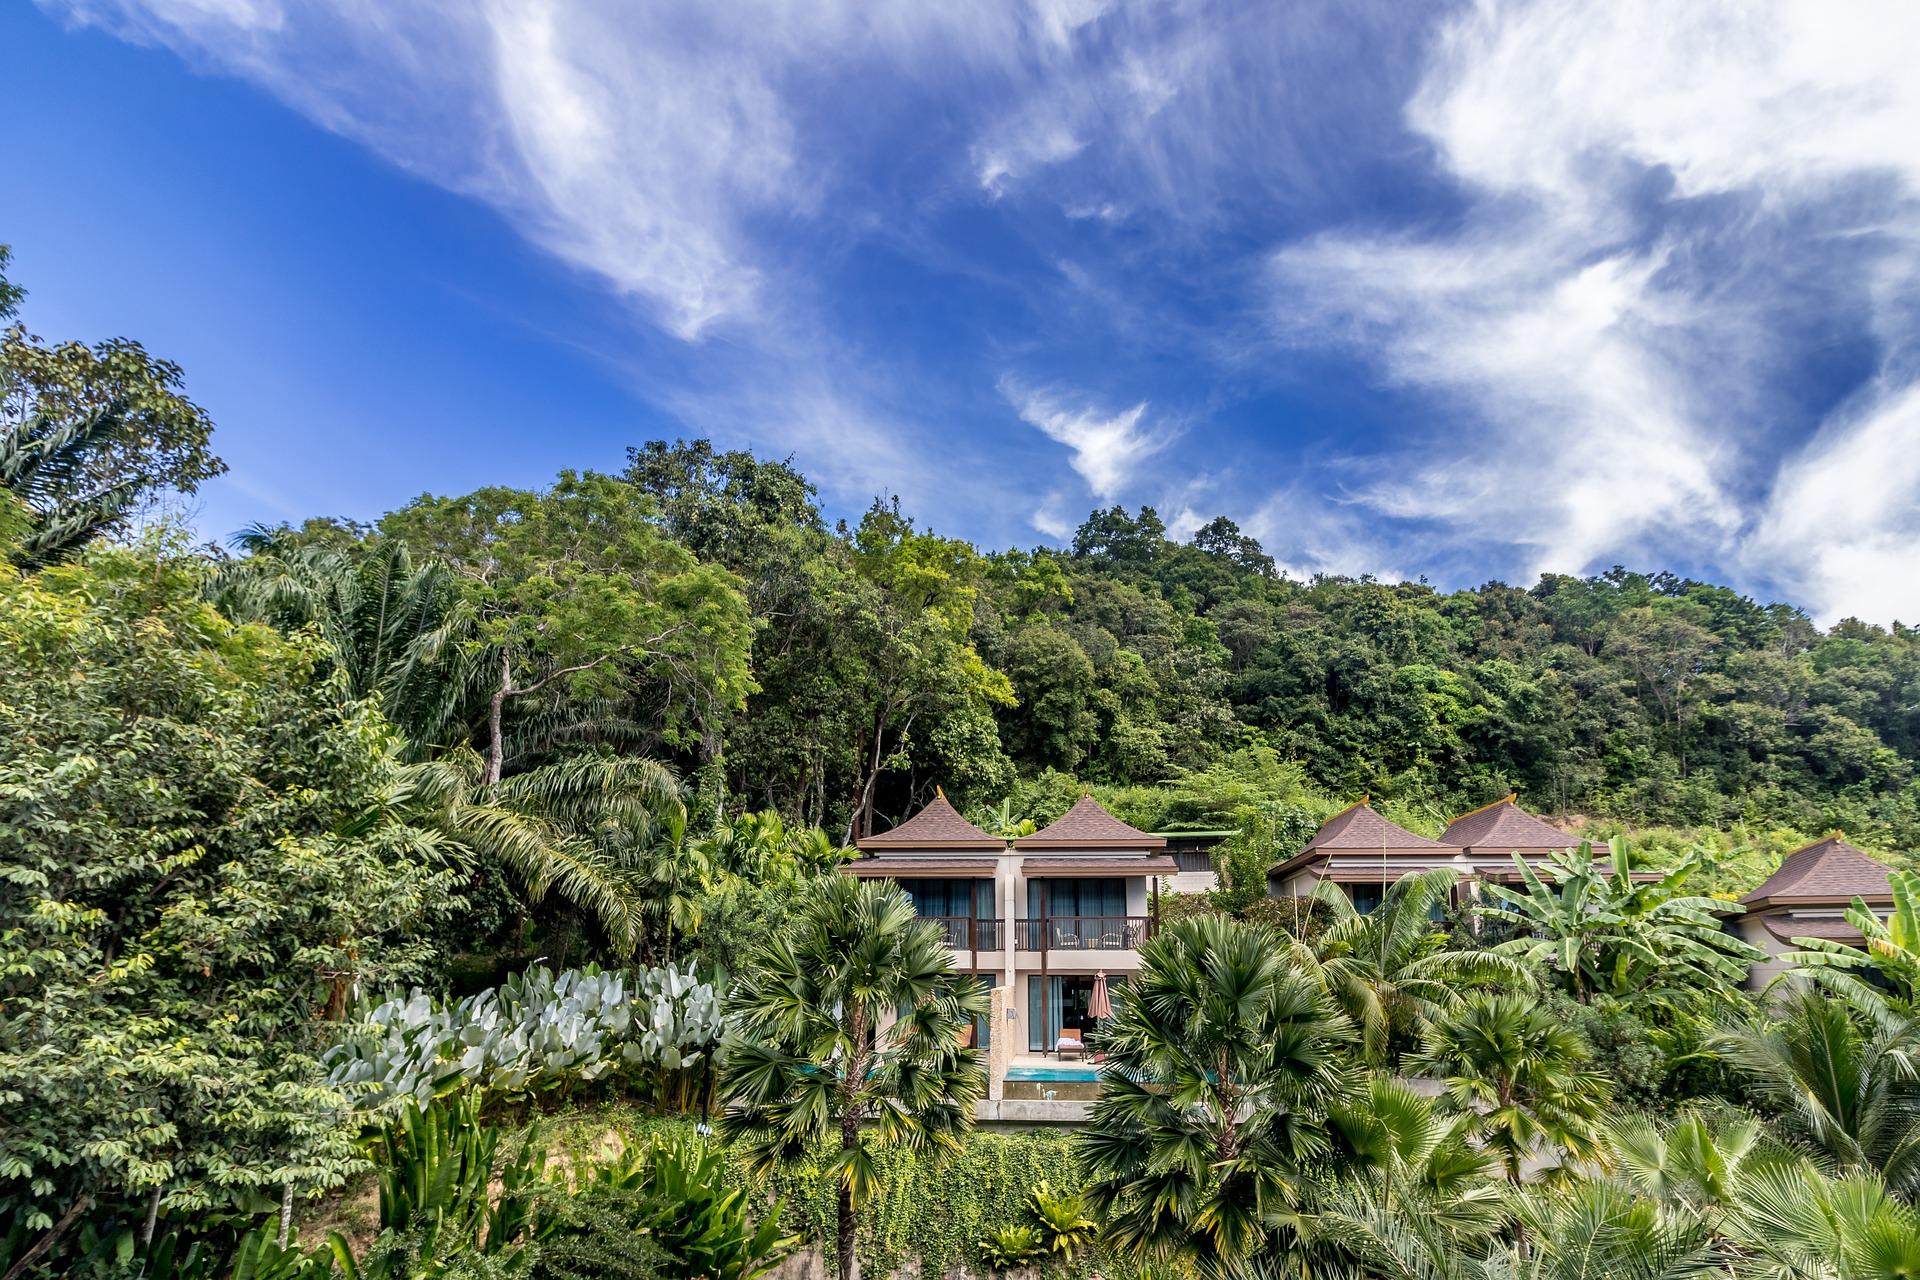 krabi_ao_nang_thailand_asie_hotel_hébergement_logement_pas_cher